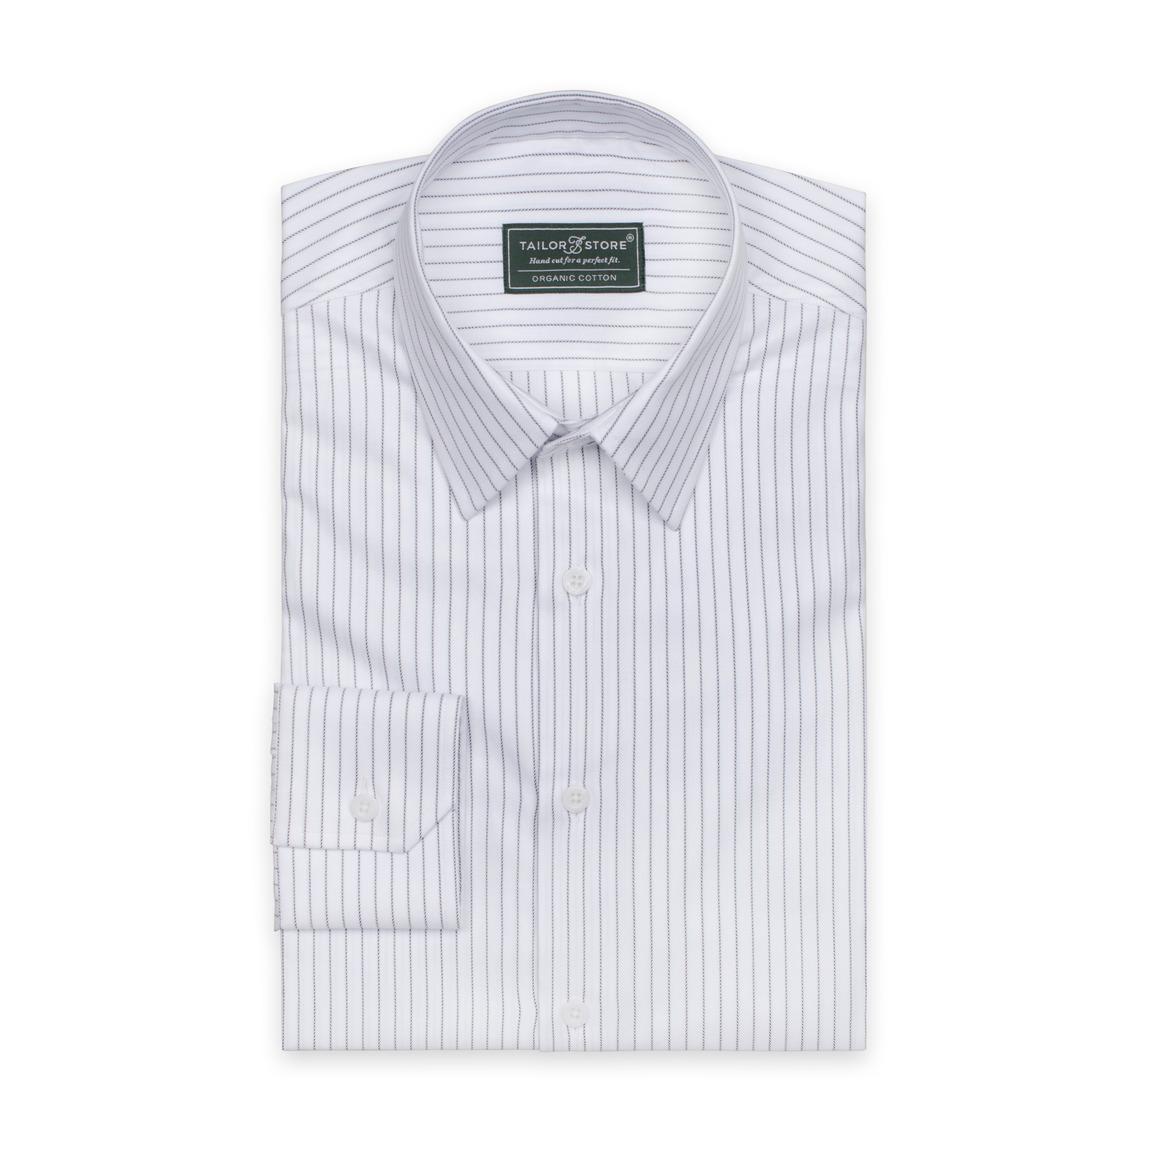 Organic dress shirt with thin black stripes